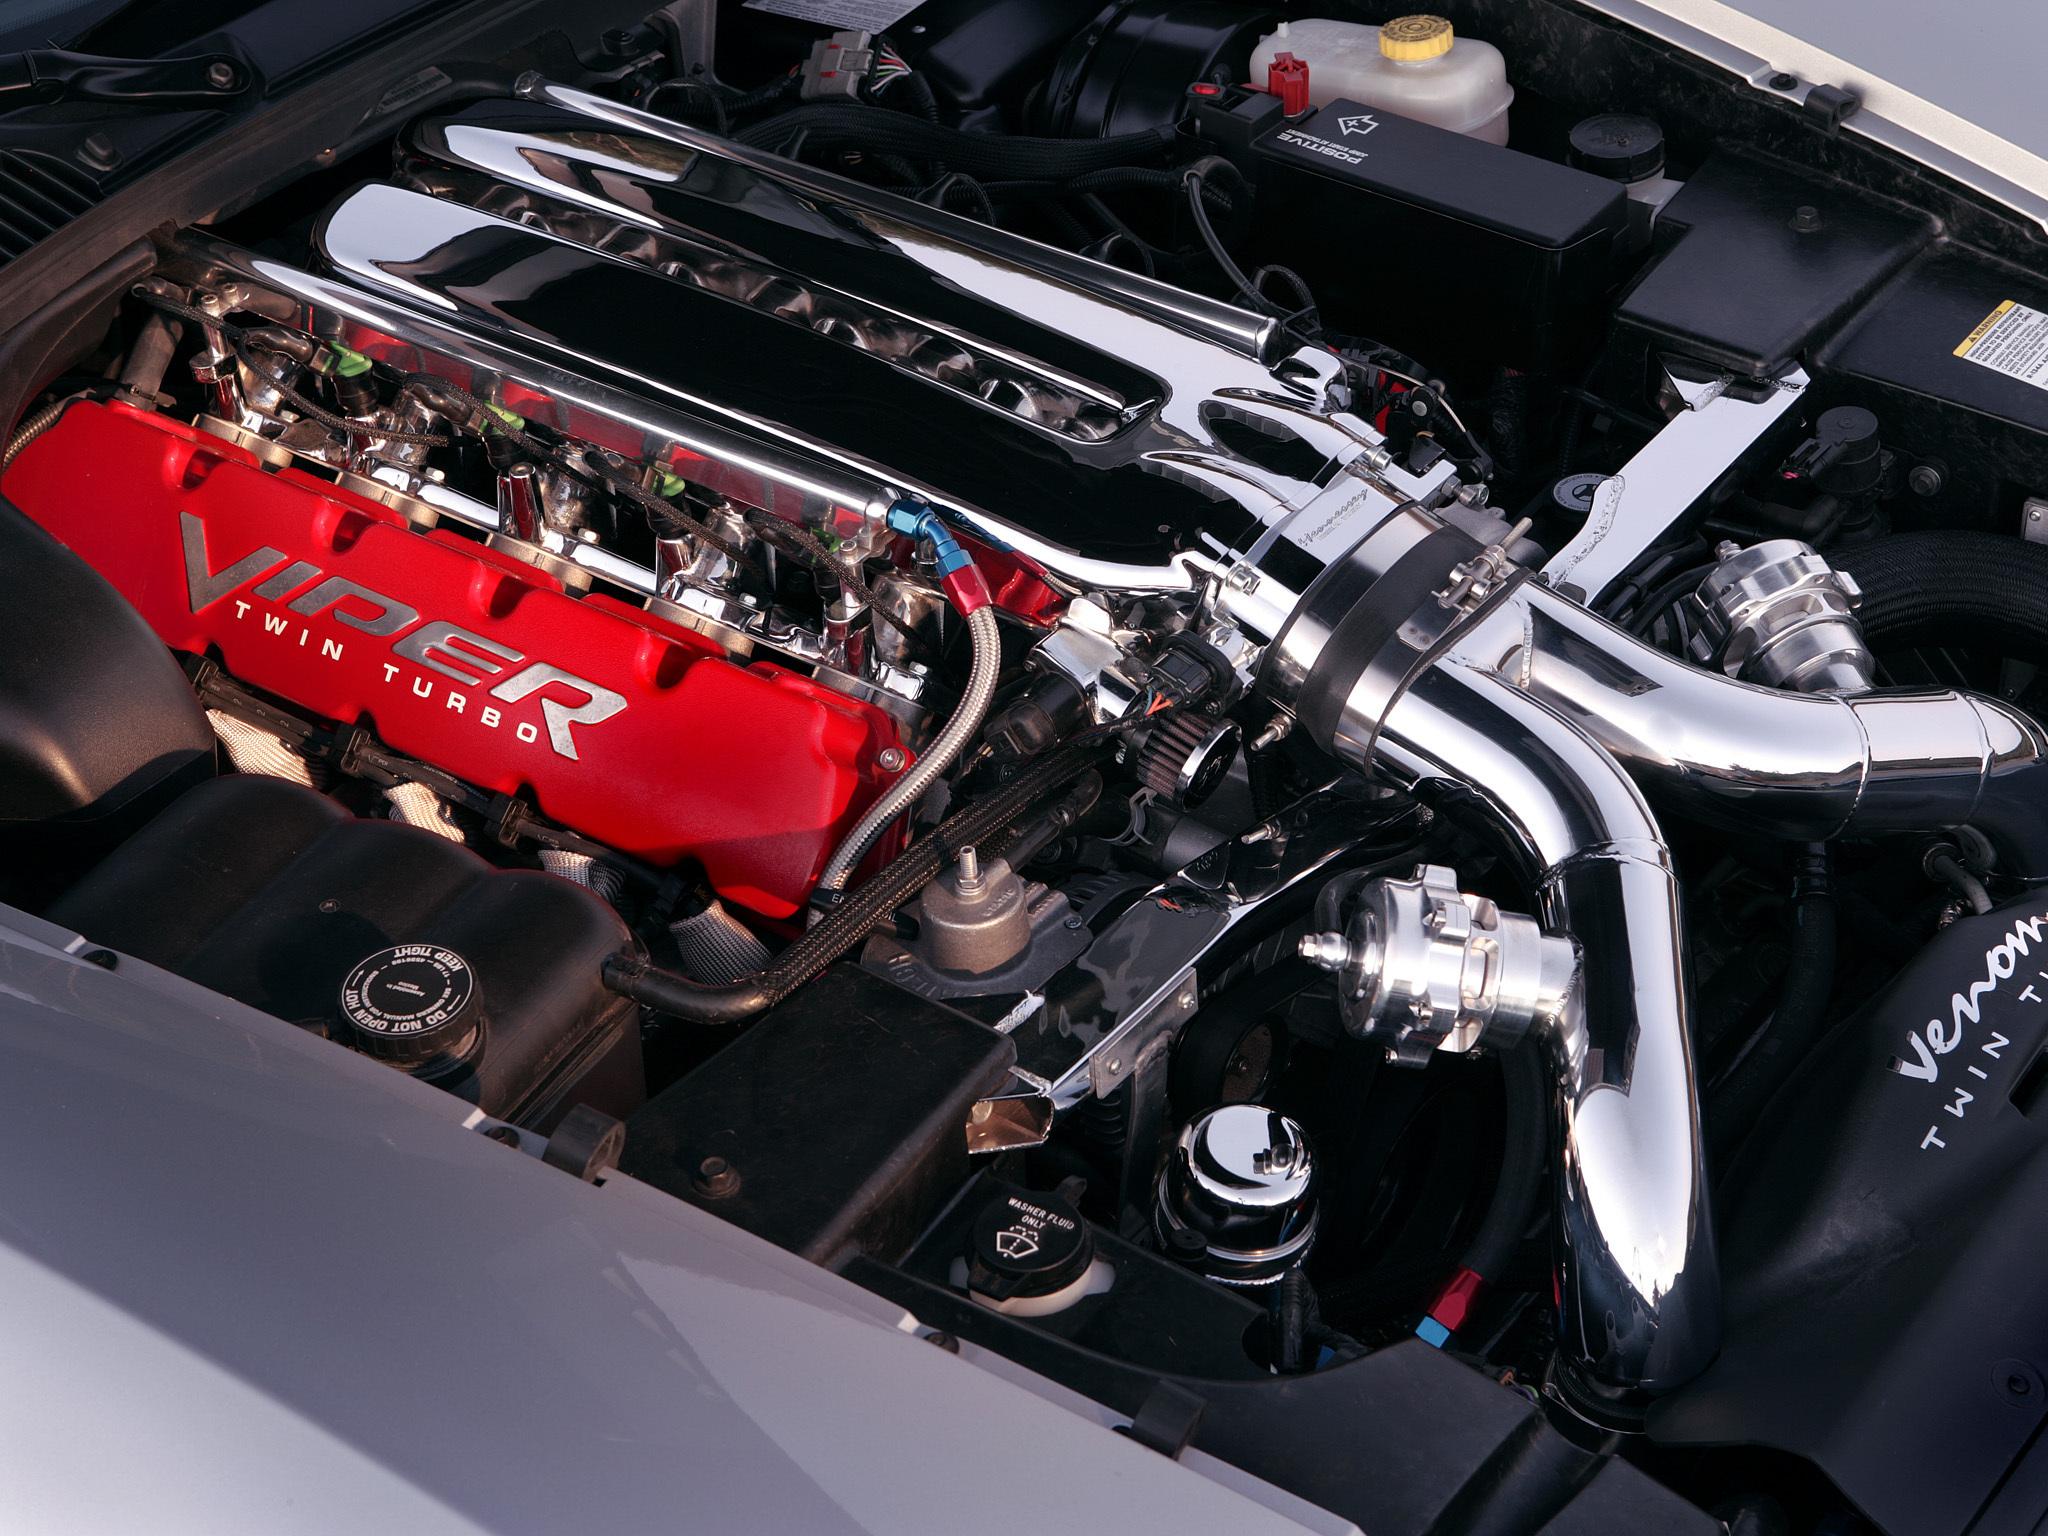 фото двигателей красиво того